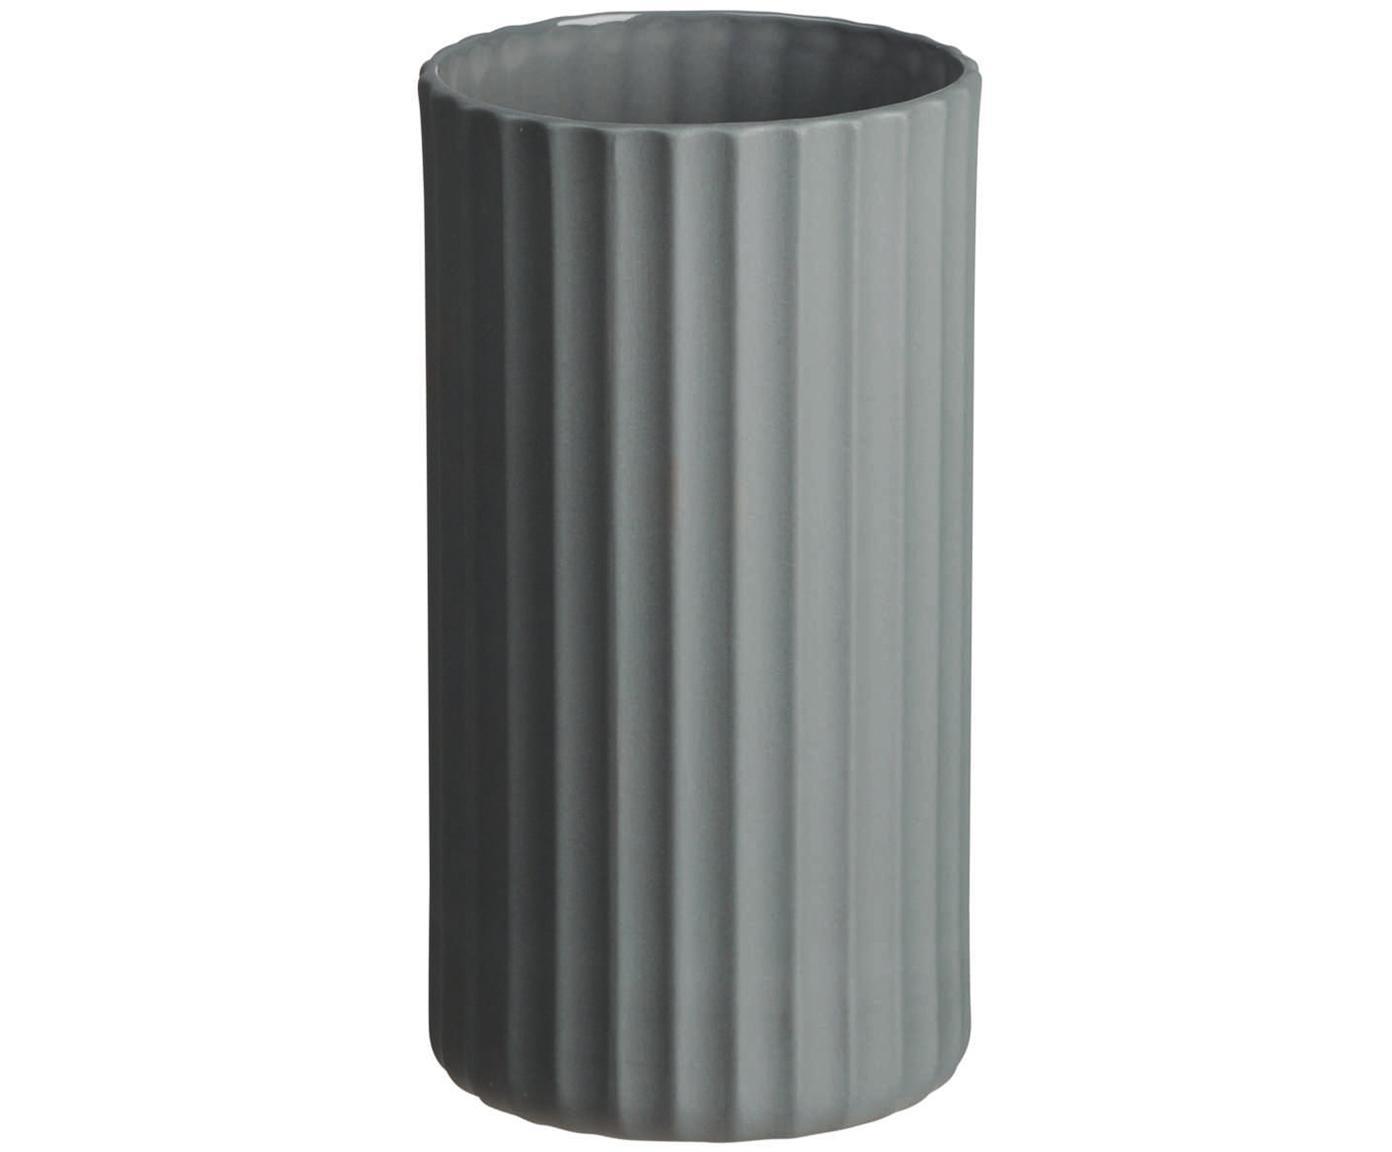 Handgefertigte Vase Yoko aus Porzellan, Porzellan, Grau, Ø 9 x H 16 cm